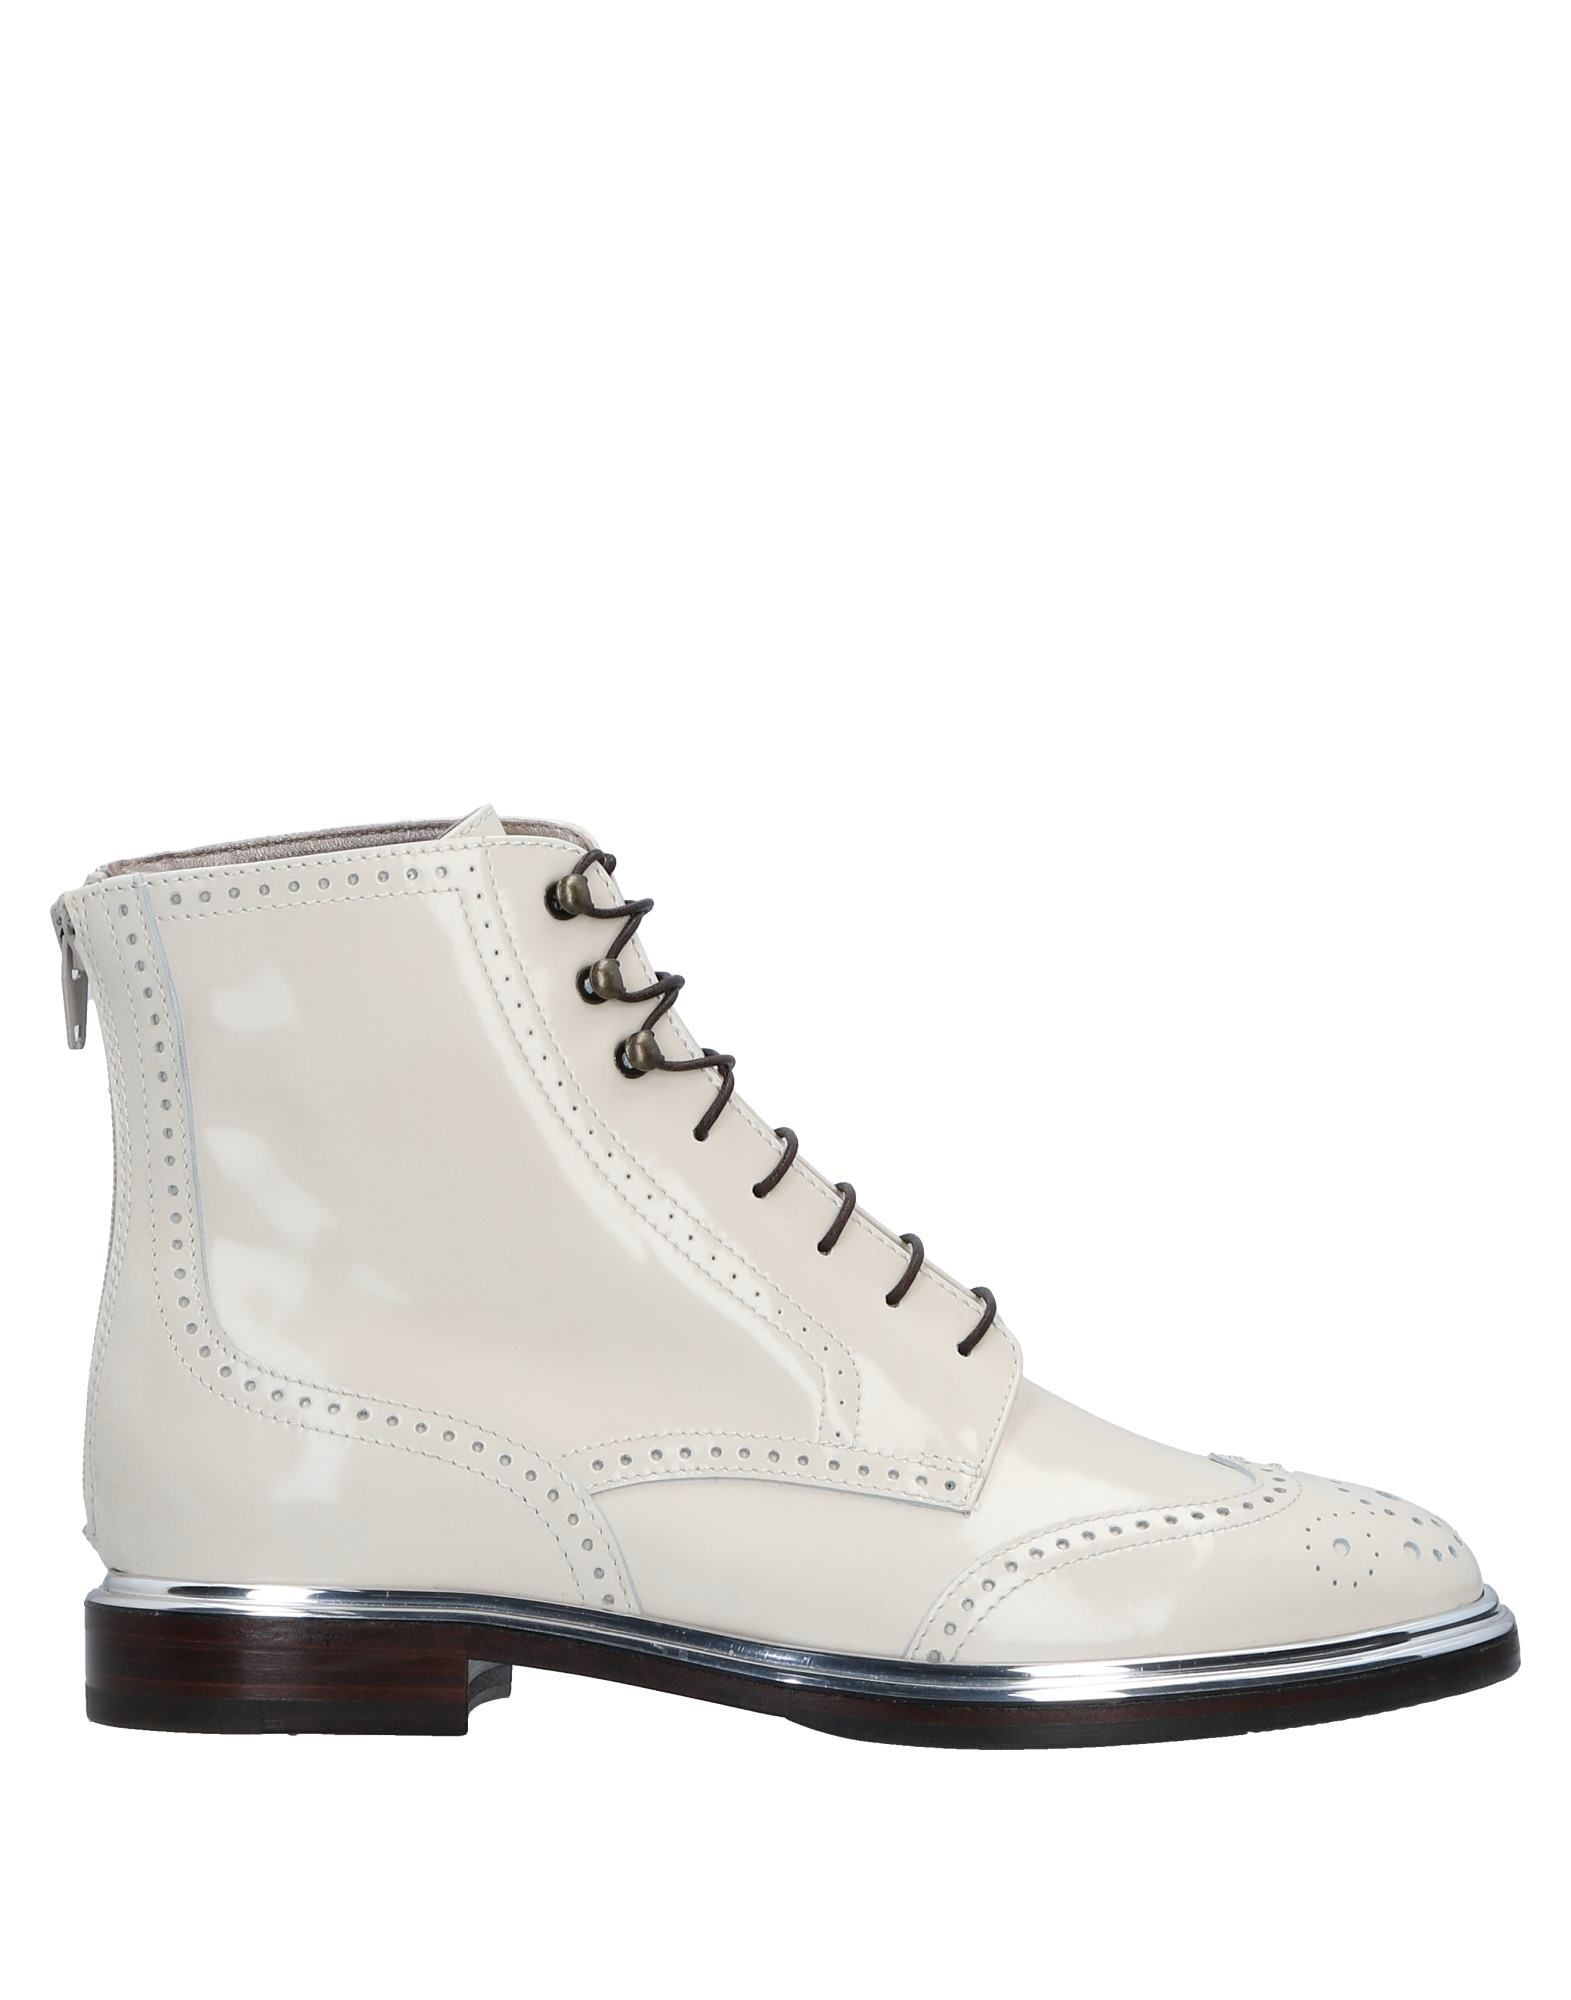 Agl Attilio Giusti Leombruni Stiefelette Damen  11539920QX Heiße Schuhe